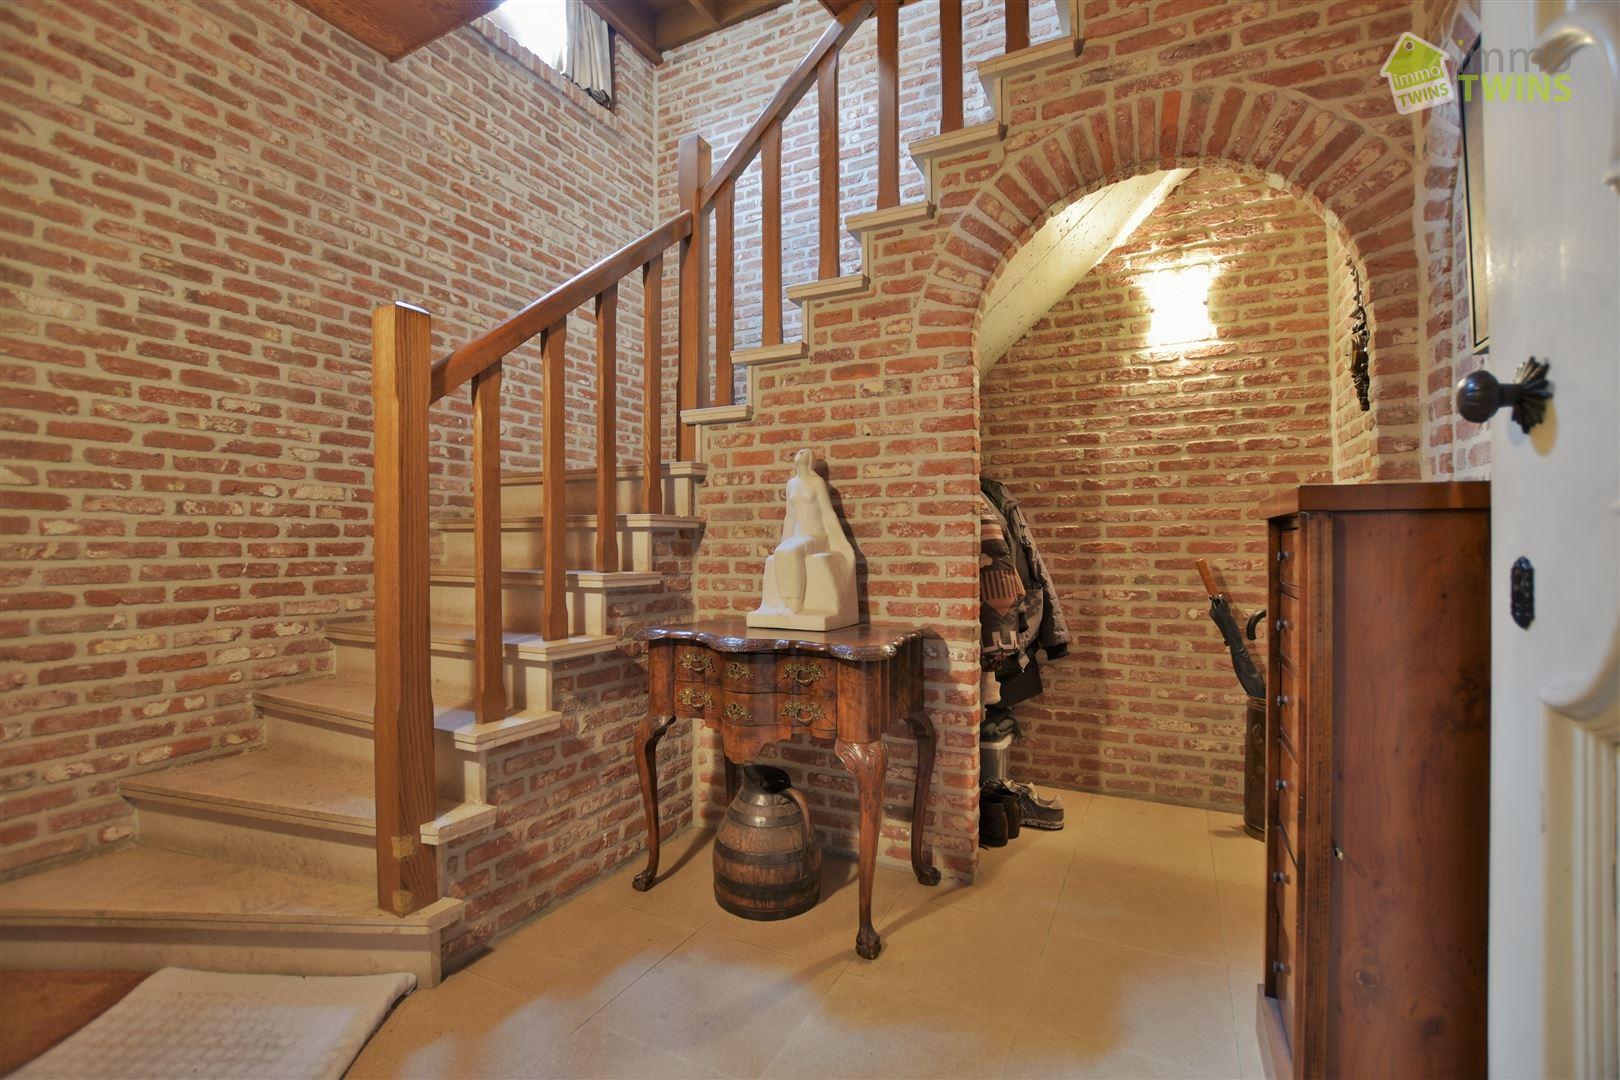 Foto 2 : Duplex/triplex te 9200 Dendermonde (België) - Prijs € 398.000